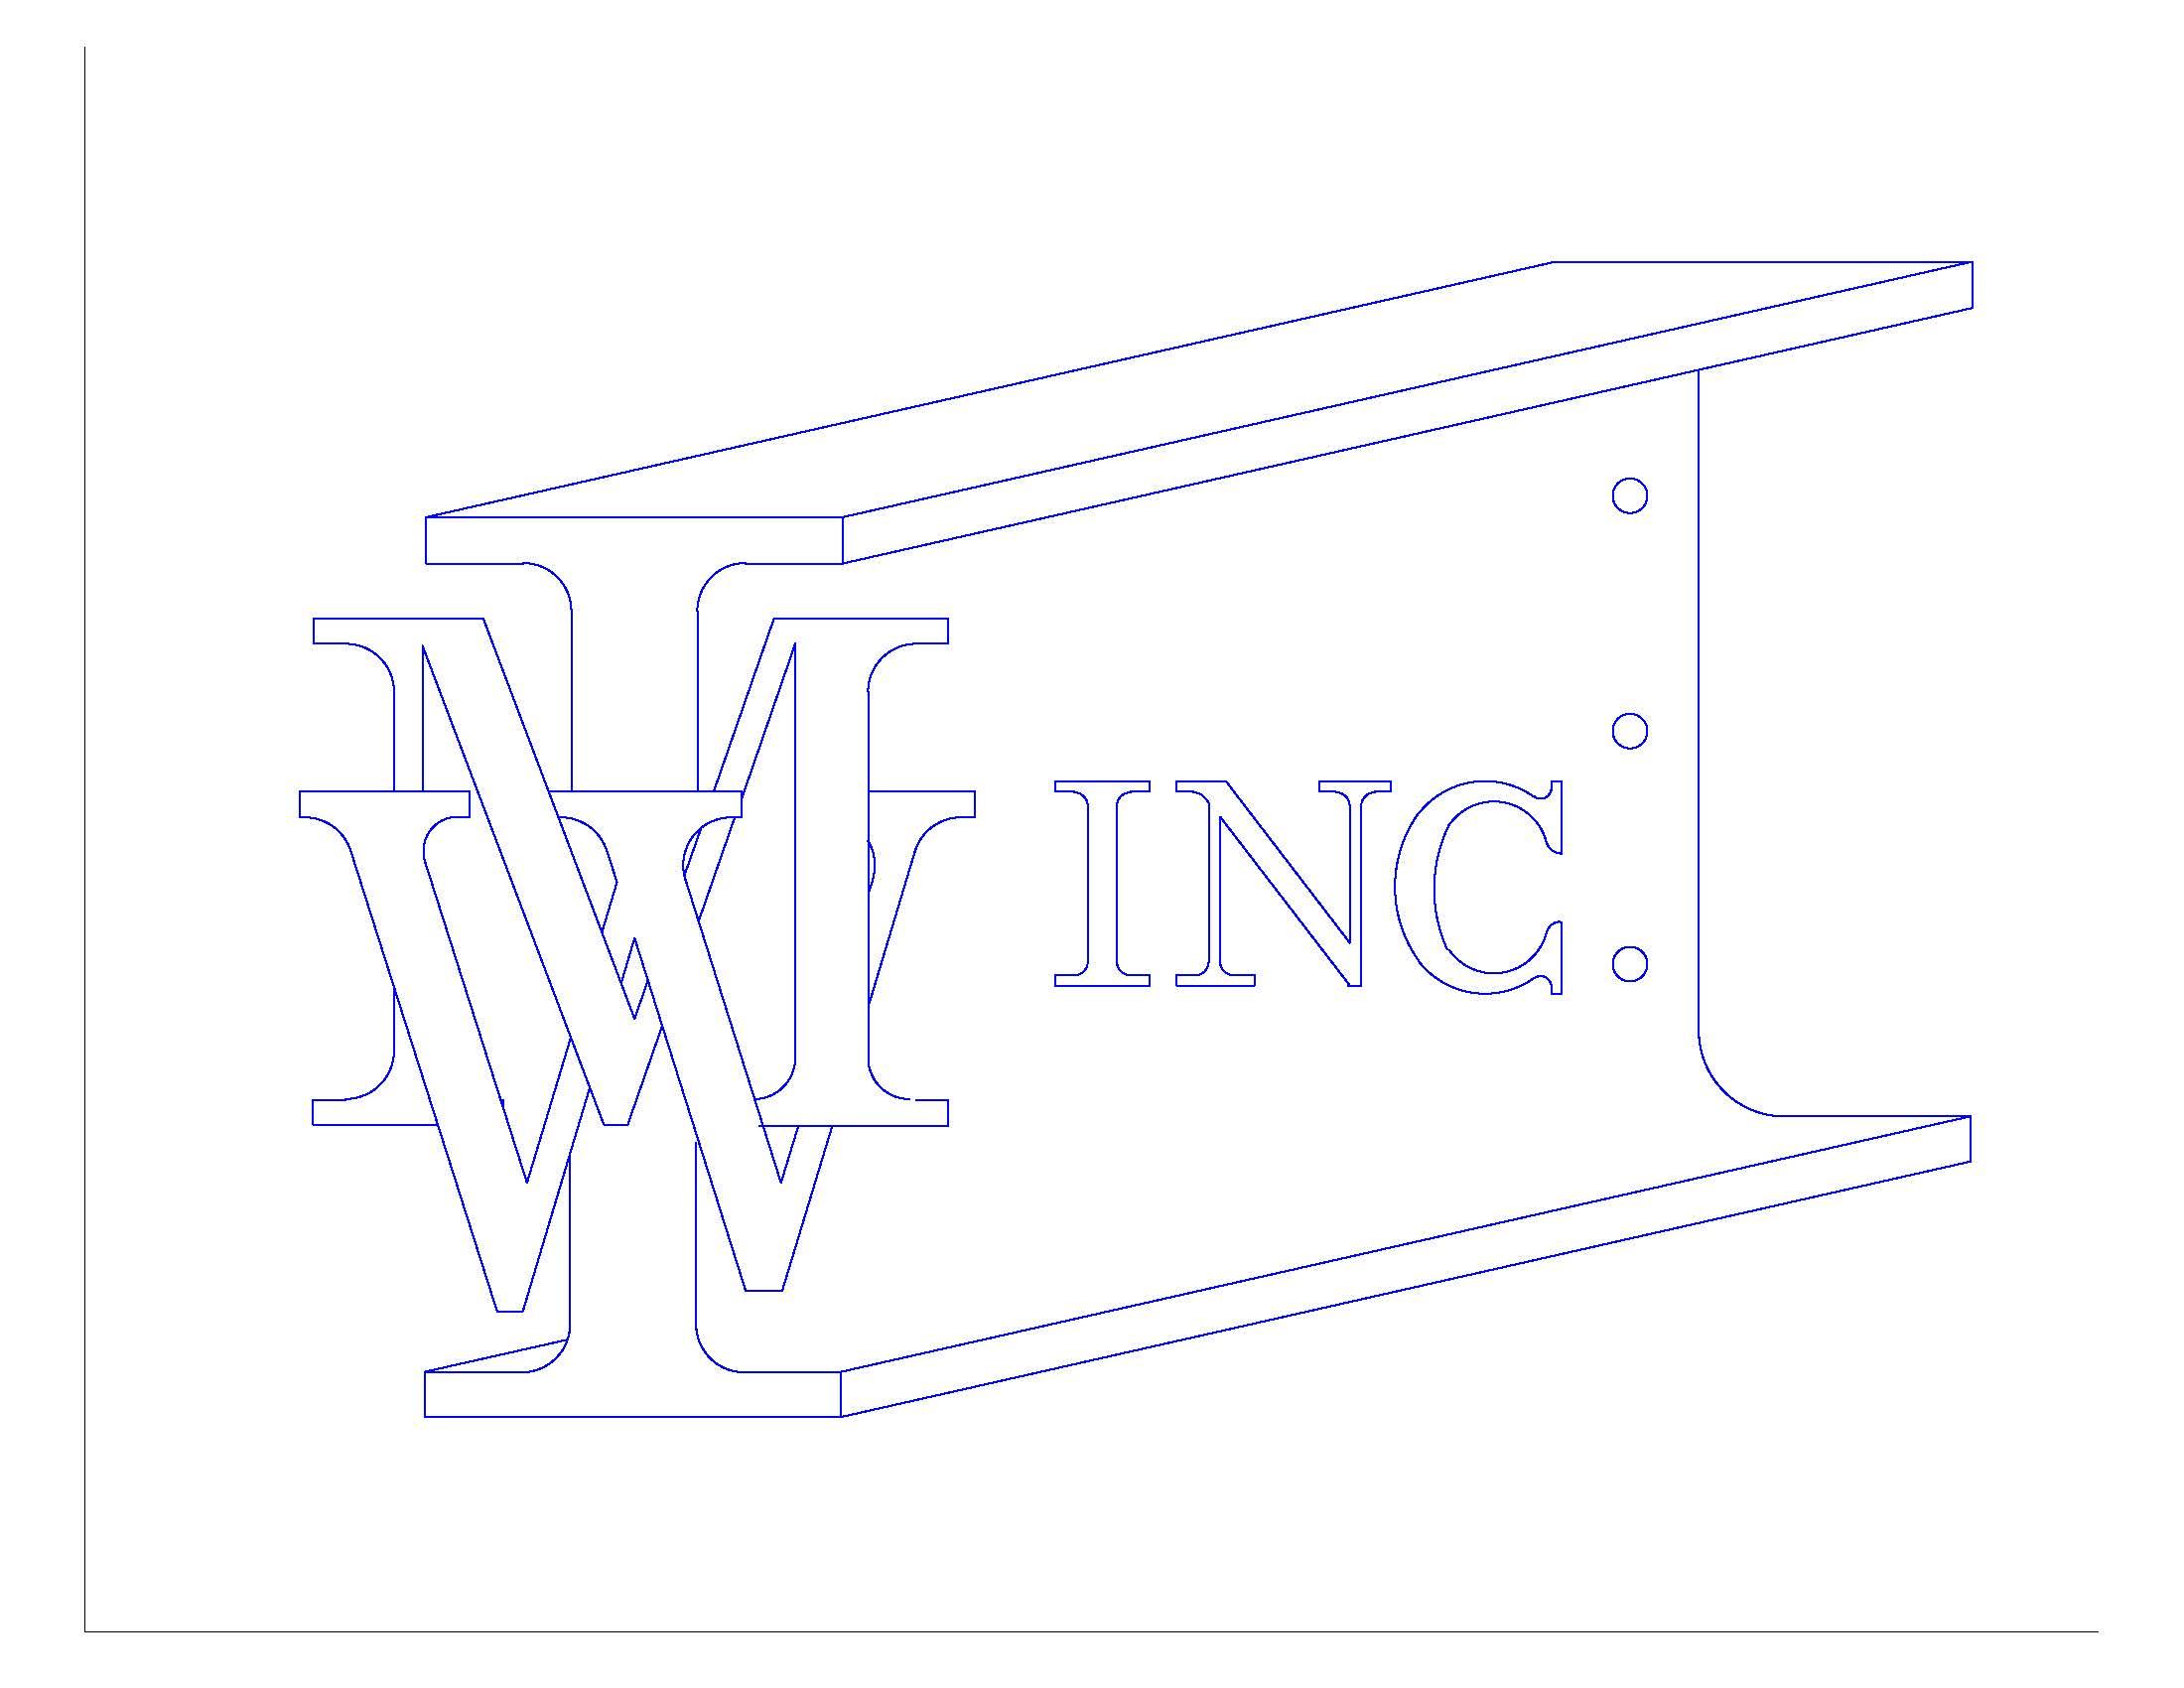 Marquez Wrought Iron, Inc.